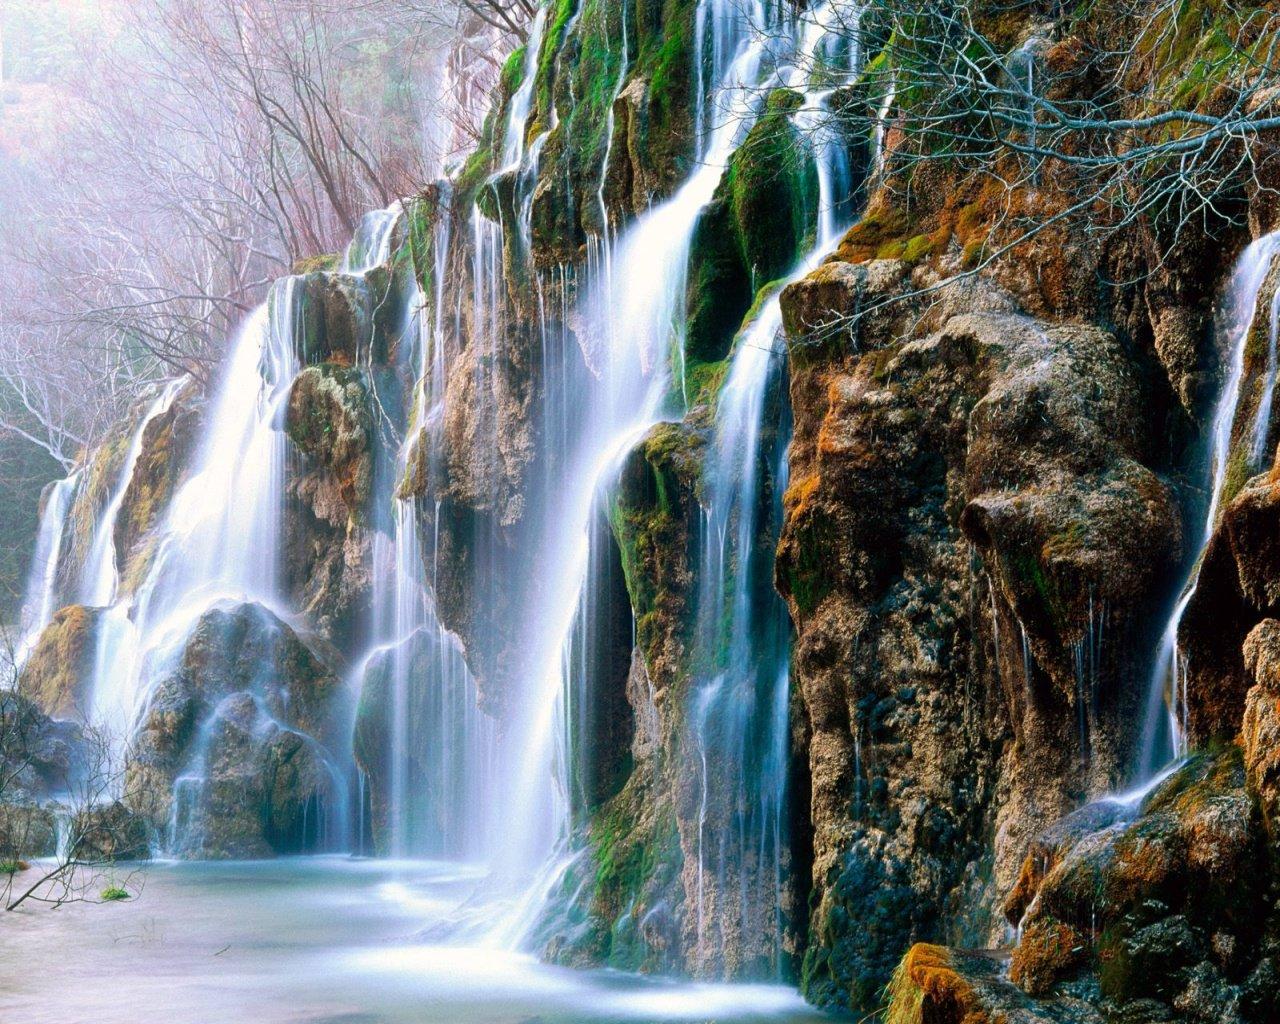 http://4.bp.blogspot.com/-G2ZgwThXRAM/T8roT3WBn6I/AAAAAAAACj0/QuxUwcI1dq8/s1600/source-of-the-river-cuervo-cuenca-province-spain-1280x1024.jpg